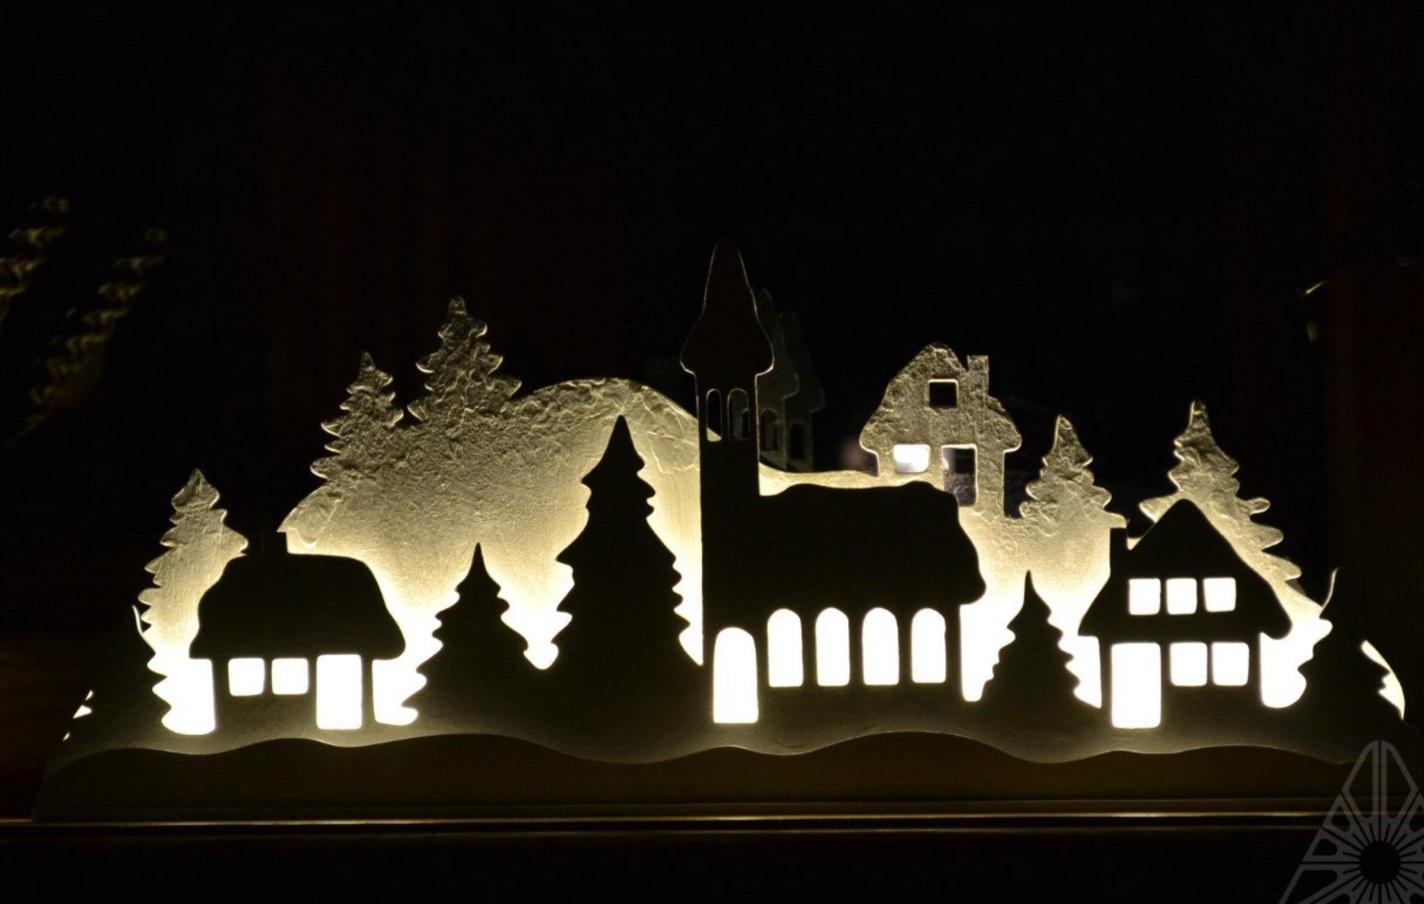 Laser Cut Christmas New Year Night Lamp Shadow Box Free Vector